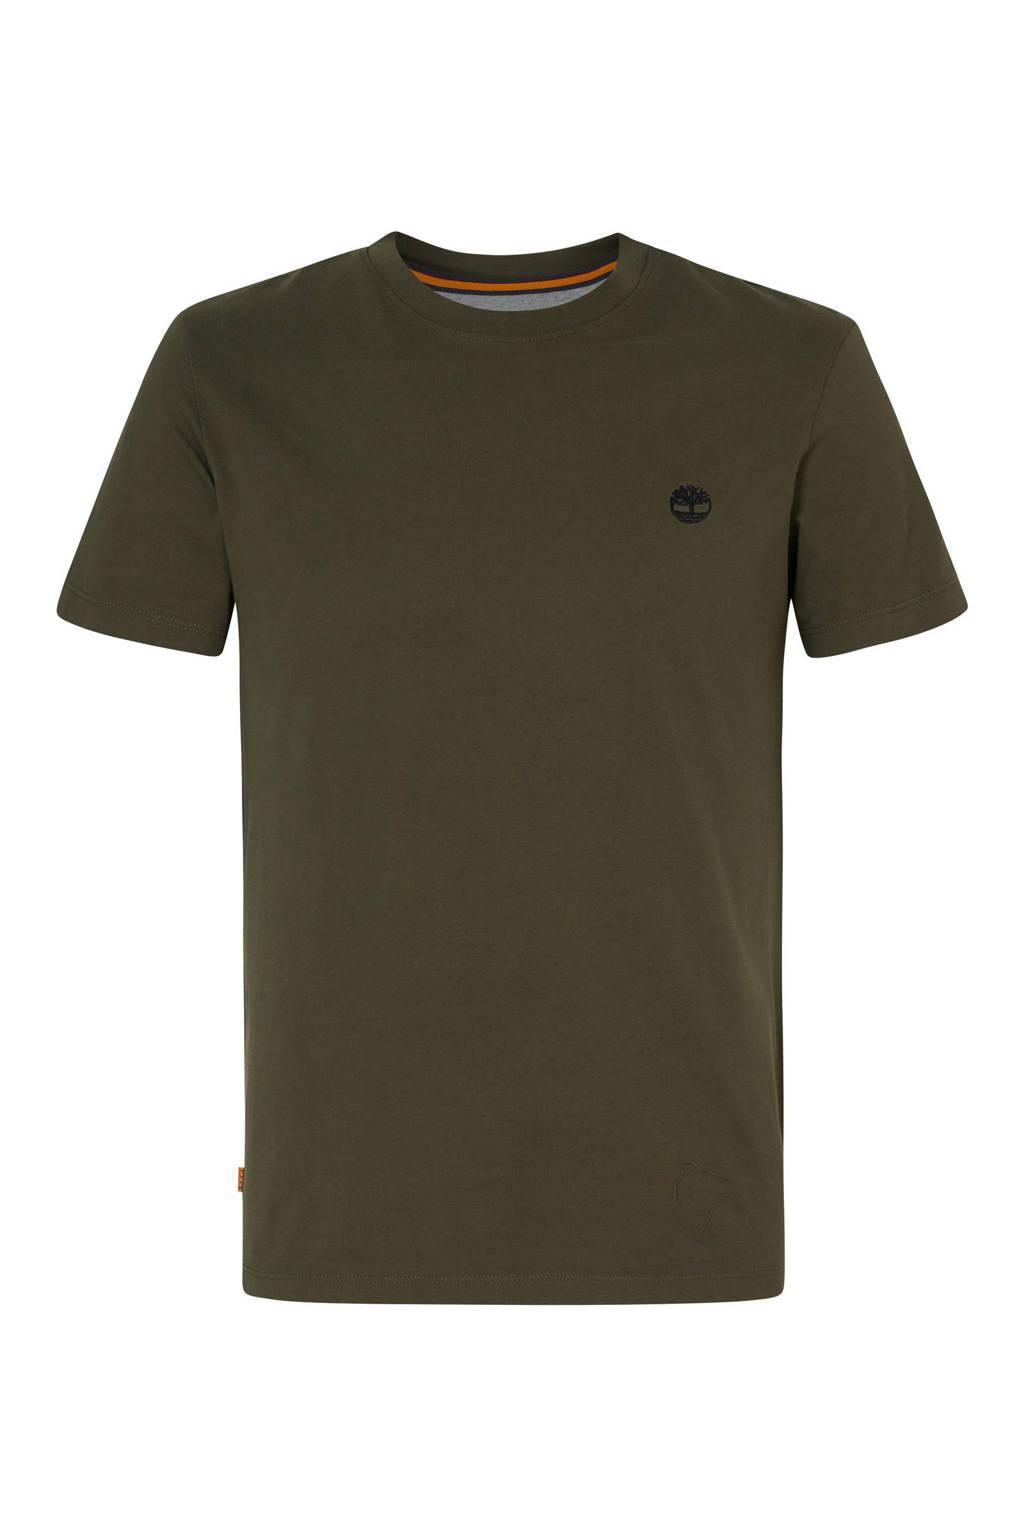 Timberland T-shirt donkergroen, Donkergroen